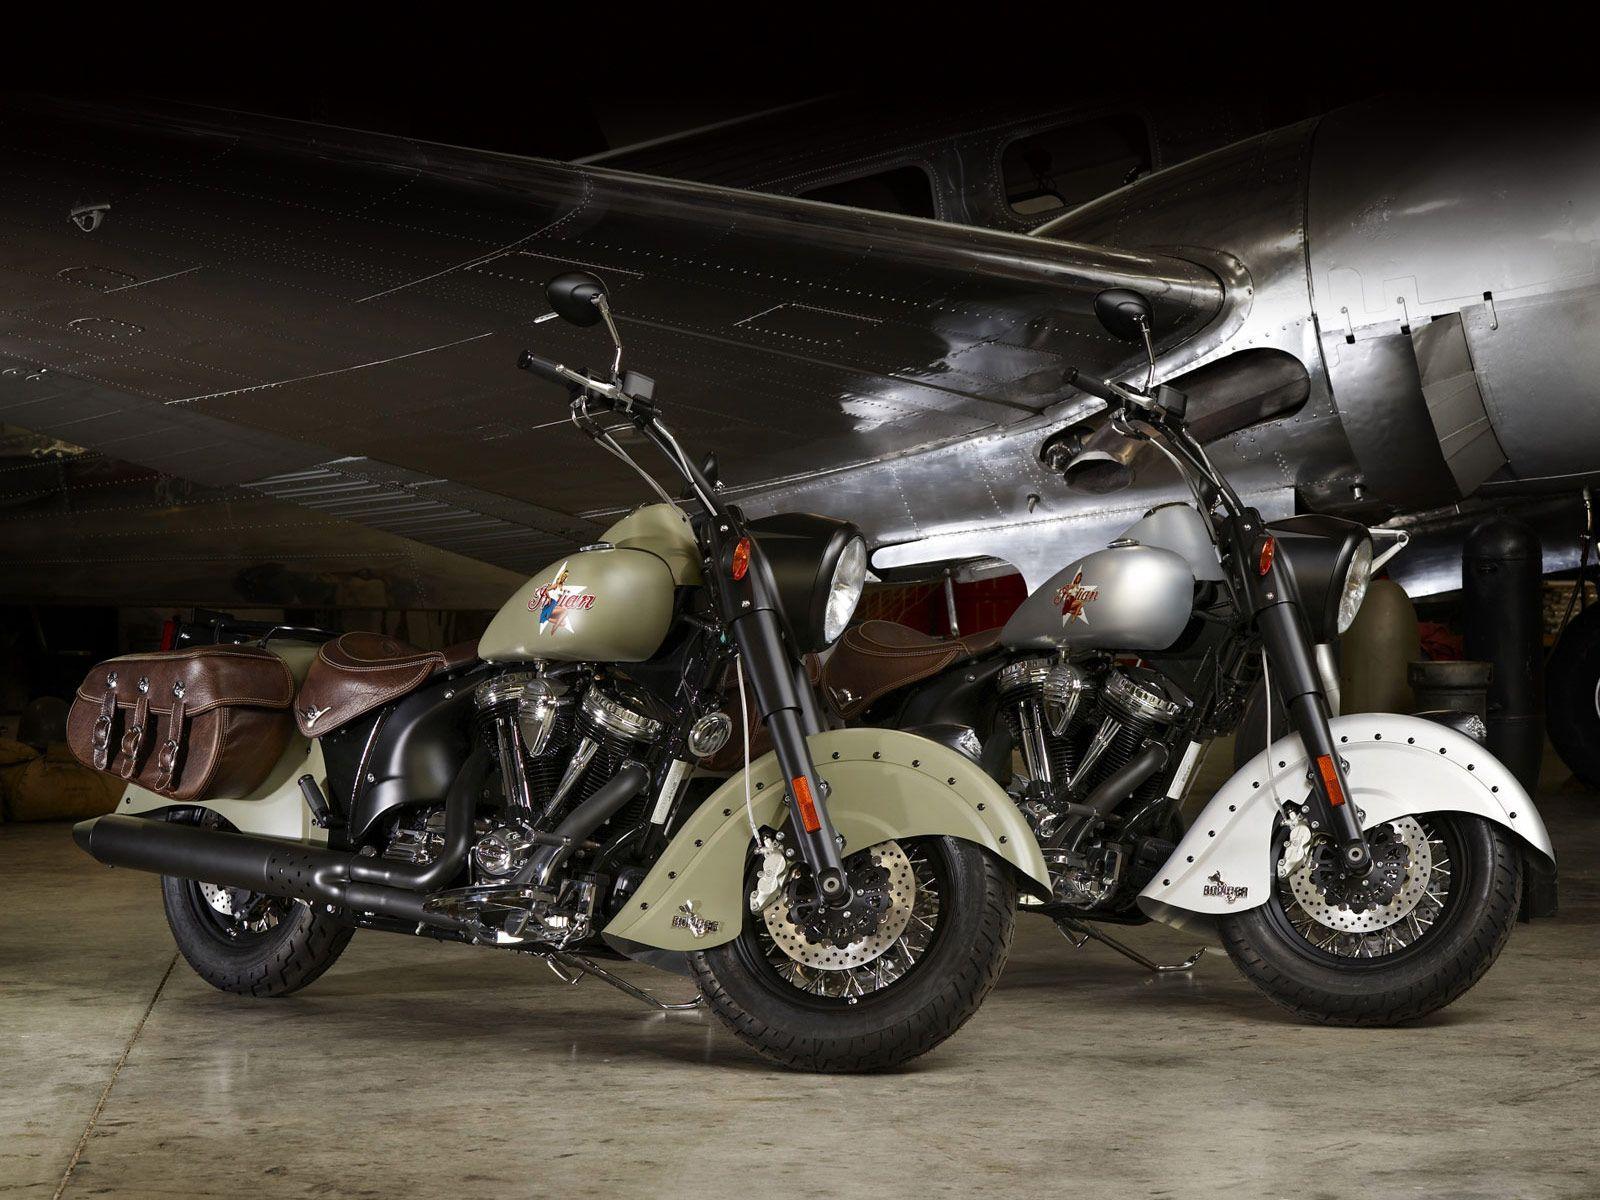 Indian Motorcycle Wallpaper Indian Motorcycle Motorcycle